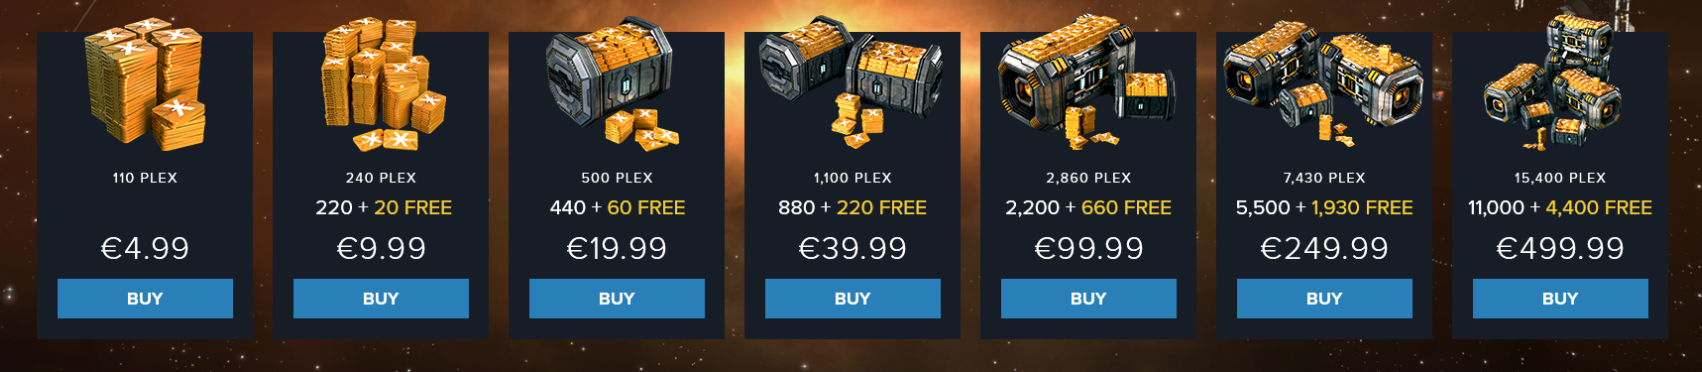 Eve Online Buy Plex With Isk